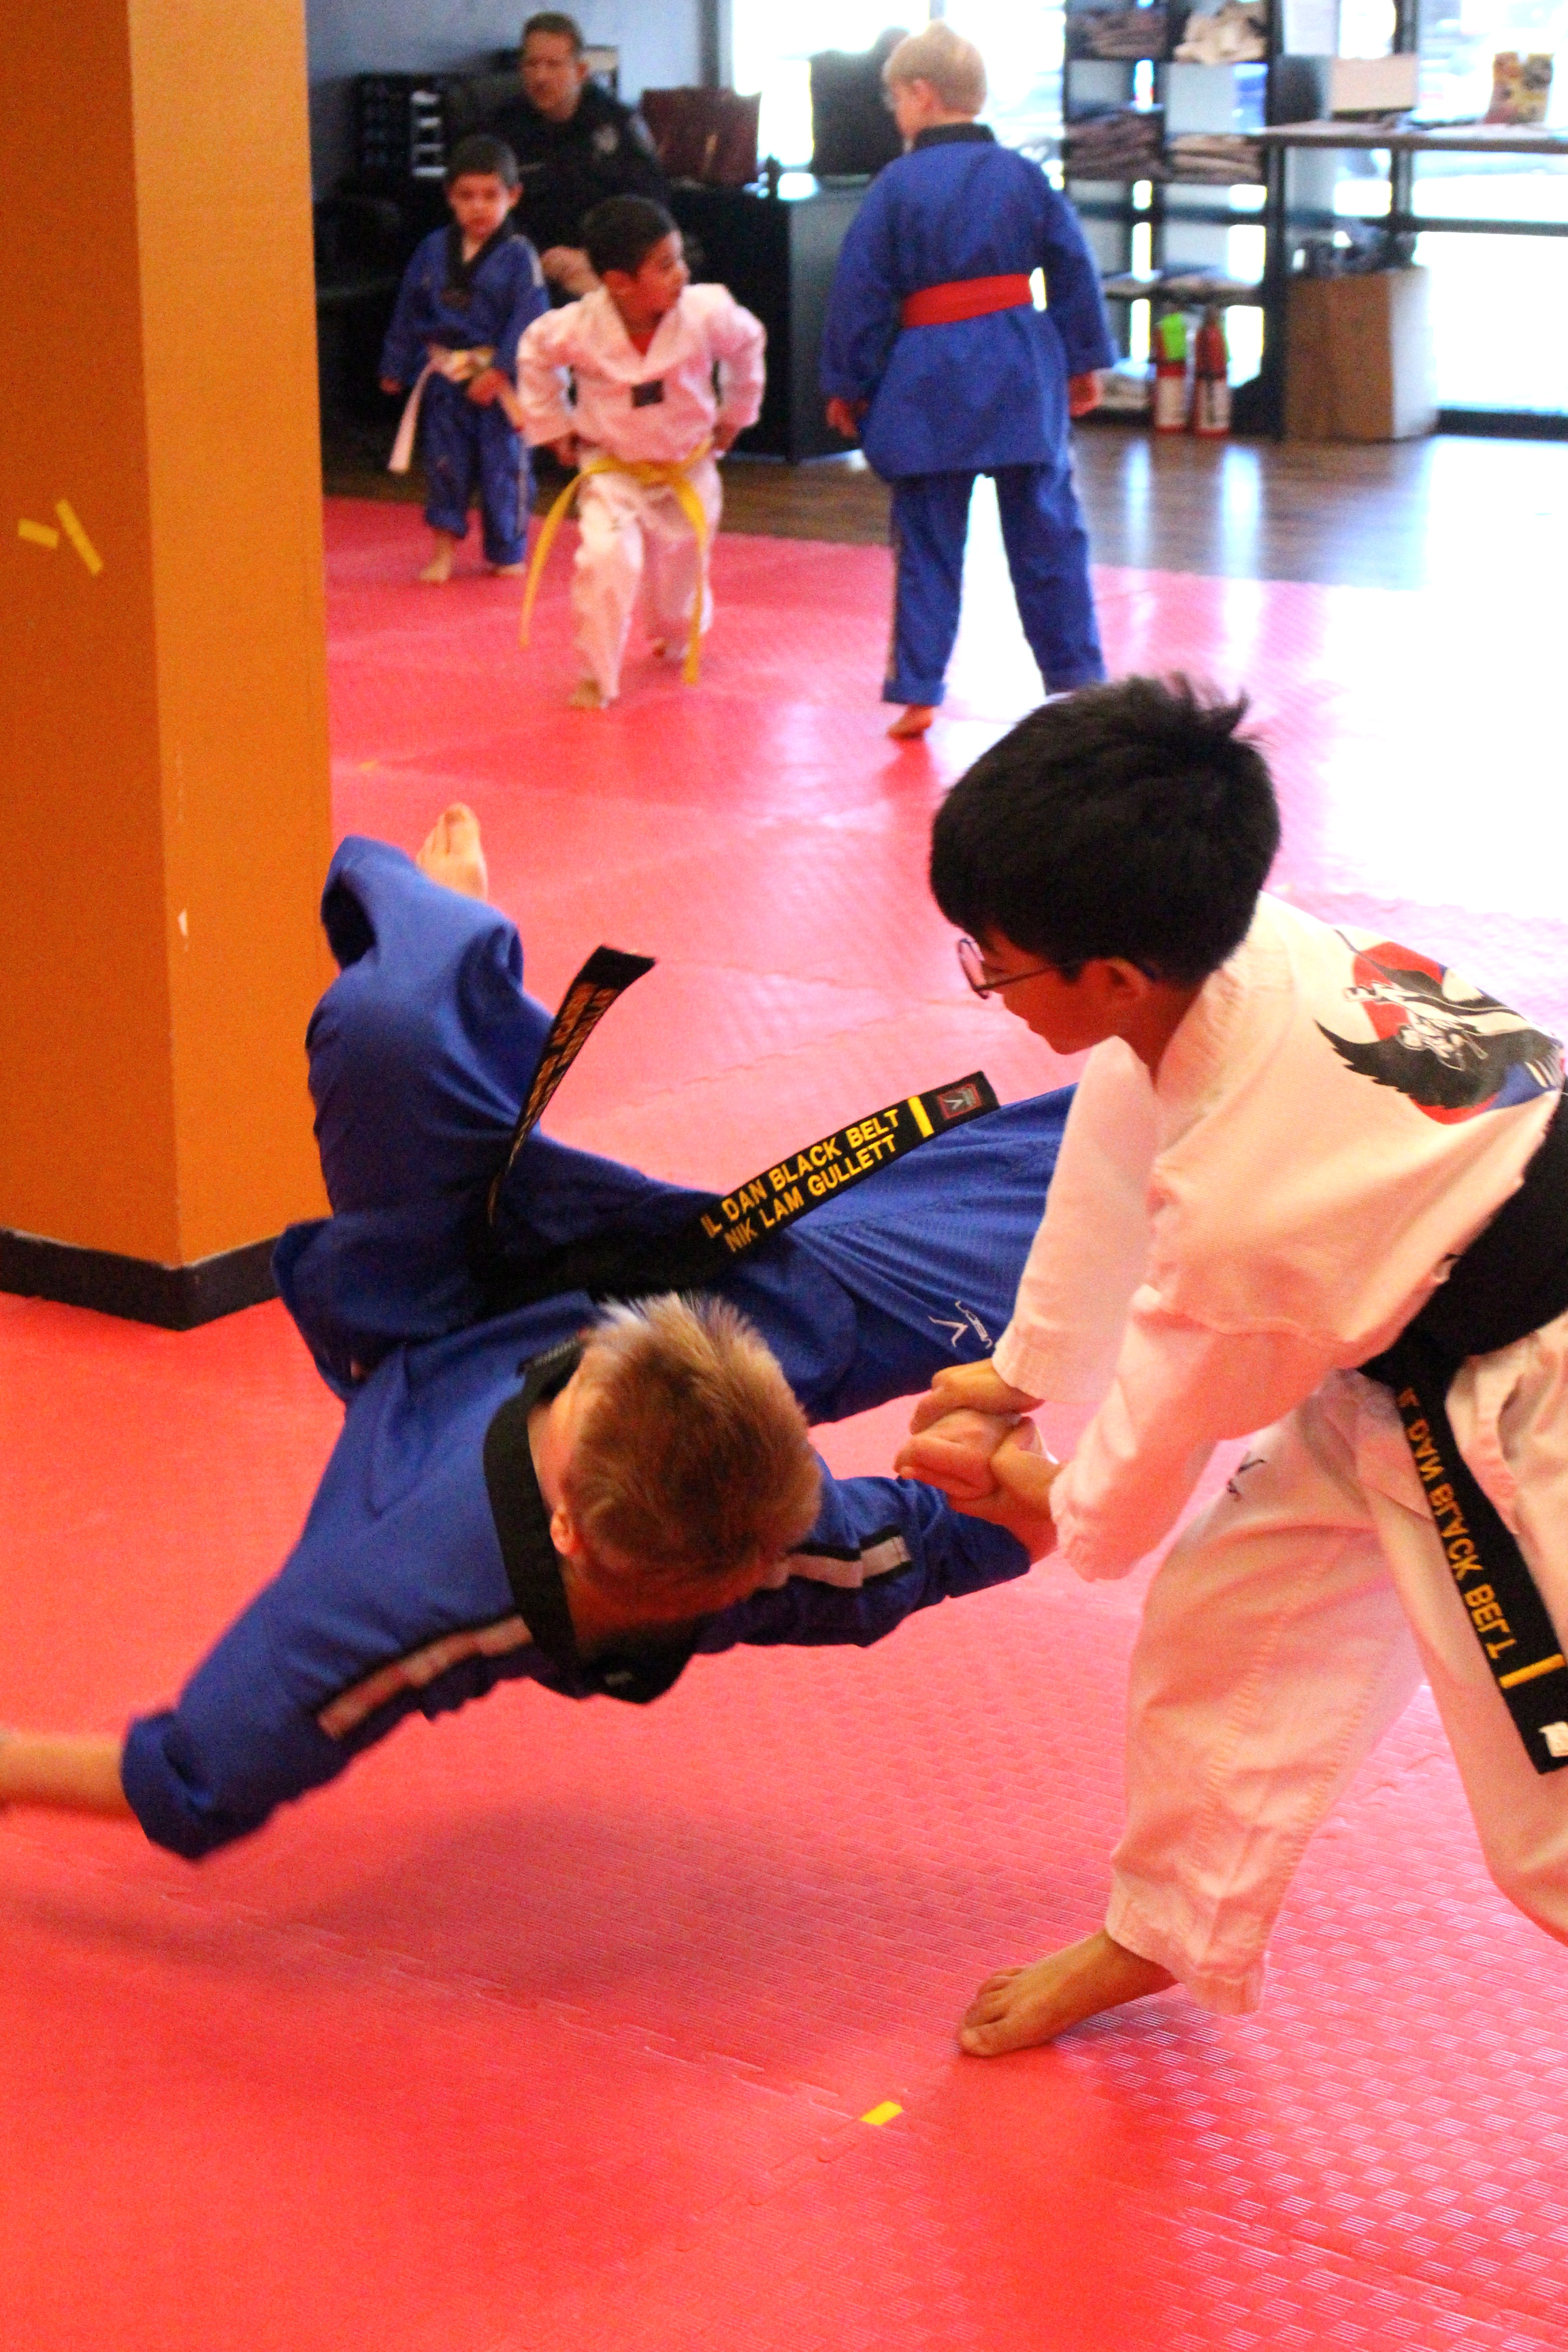 Family Martial Arts - Taekwondo Hapkido